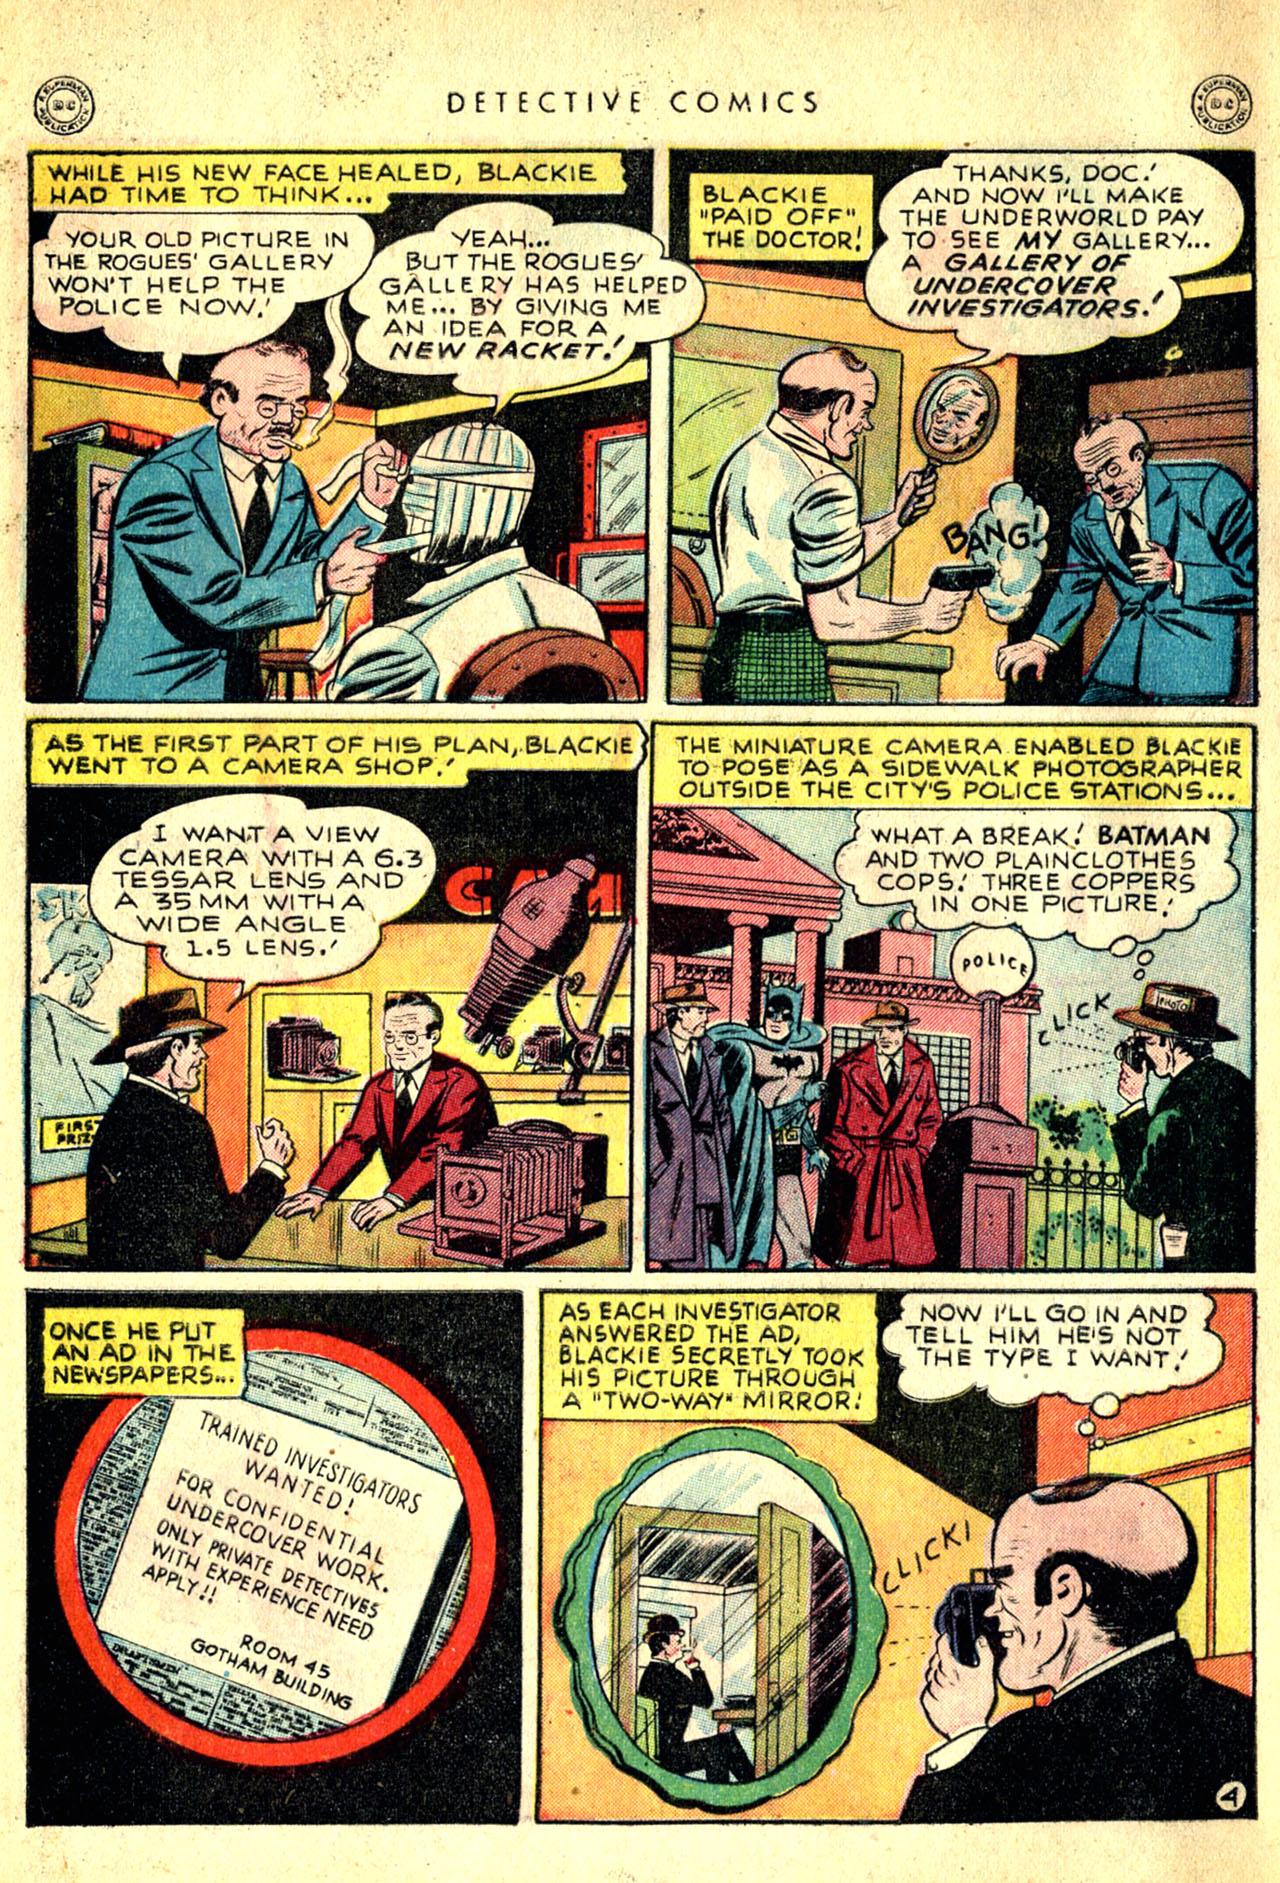 Detective Comics (1937) 141 Page 5